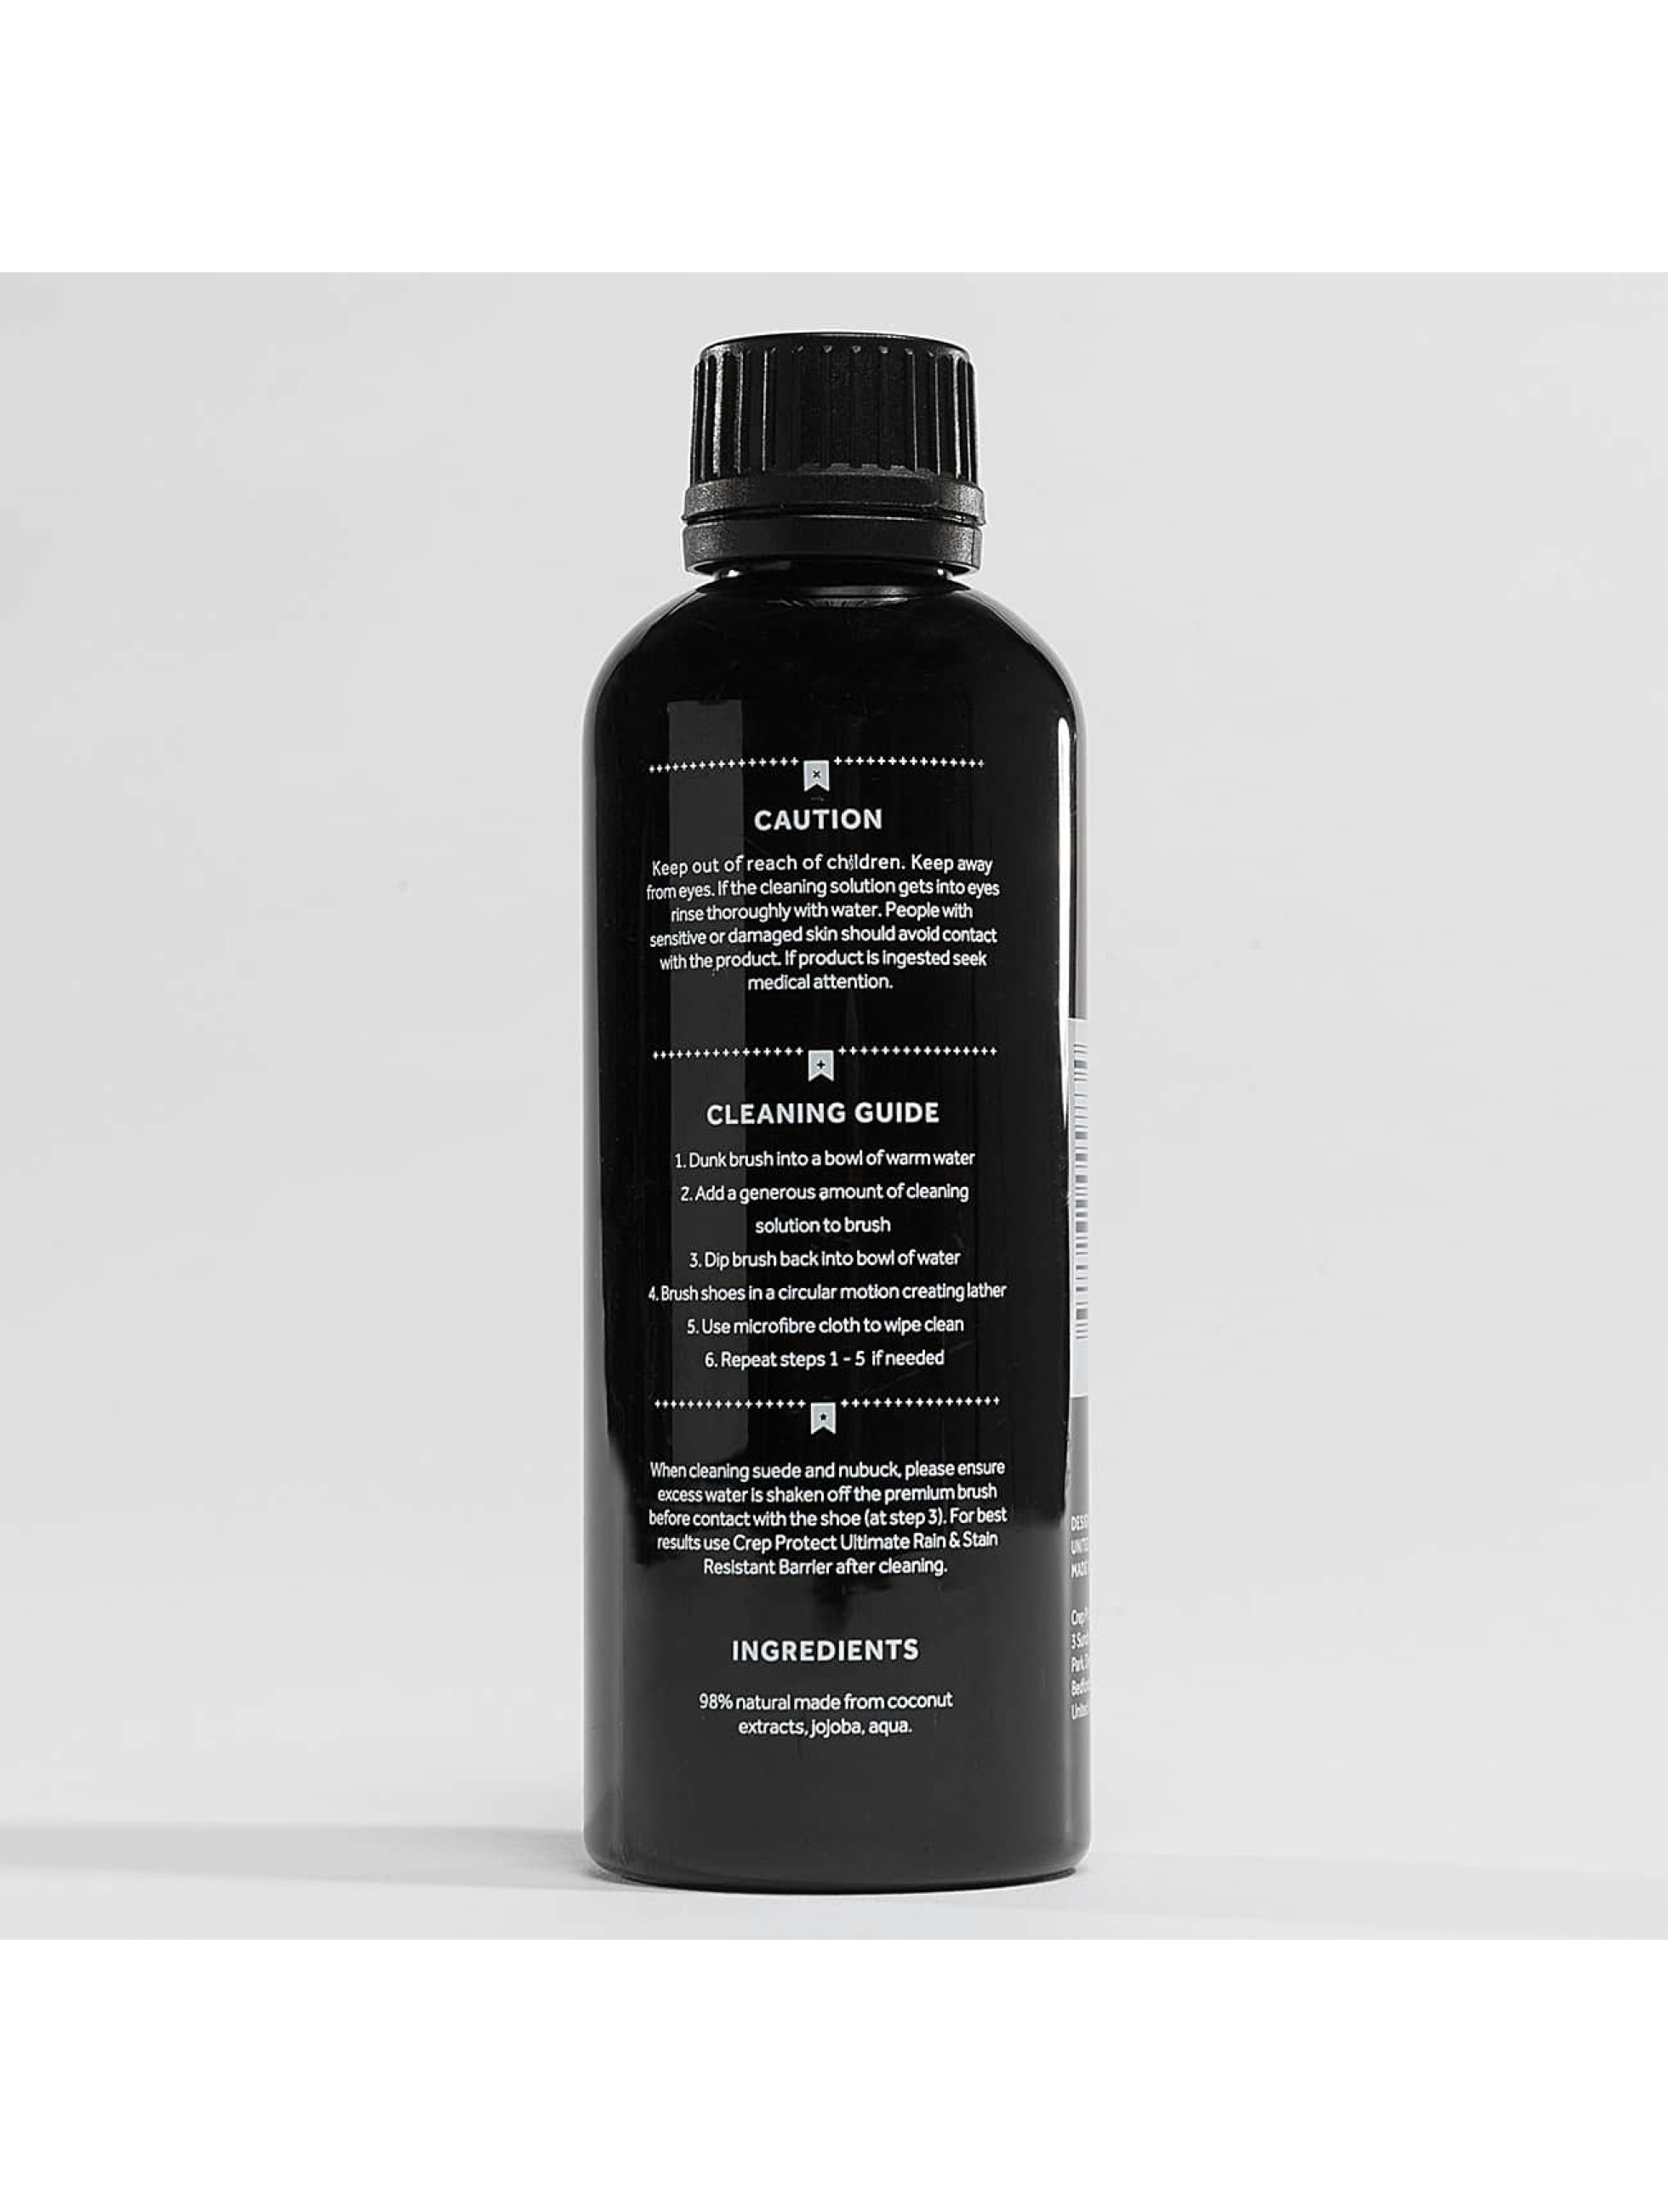 Crep Protect Прочее Protect Cure Refill черный